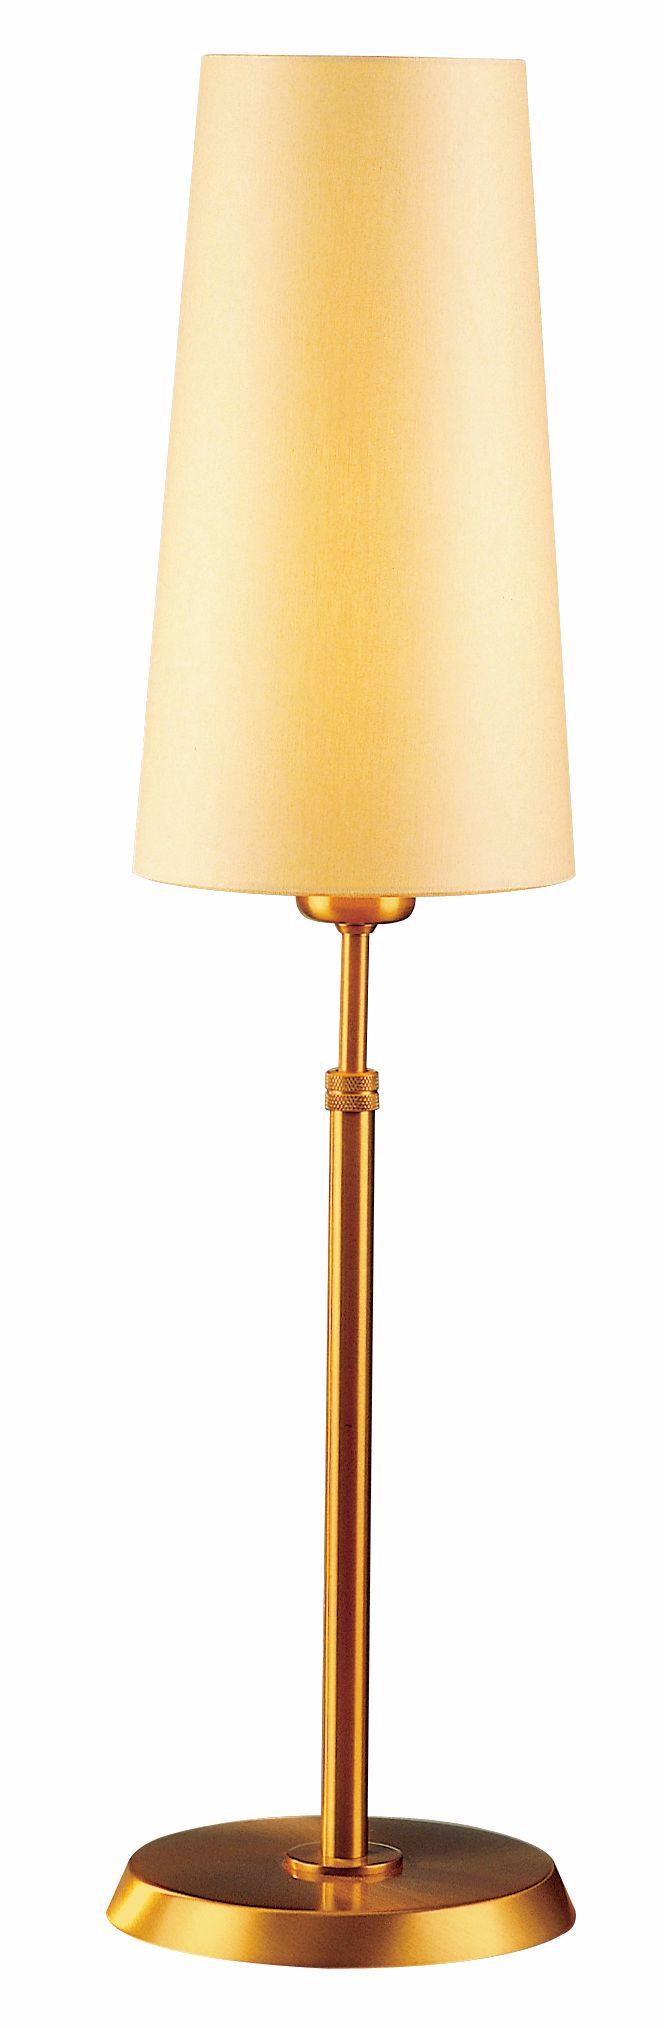 Holtkoetter Antique Brass Table Lamp with Slim Kupfer Shade